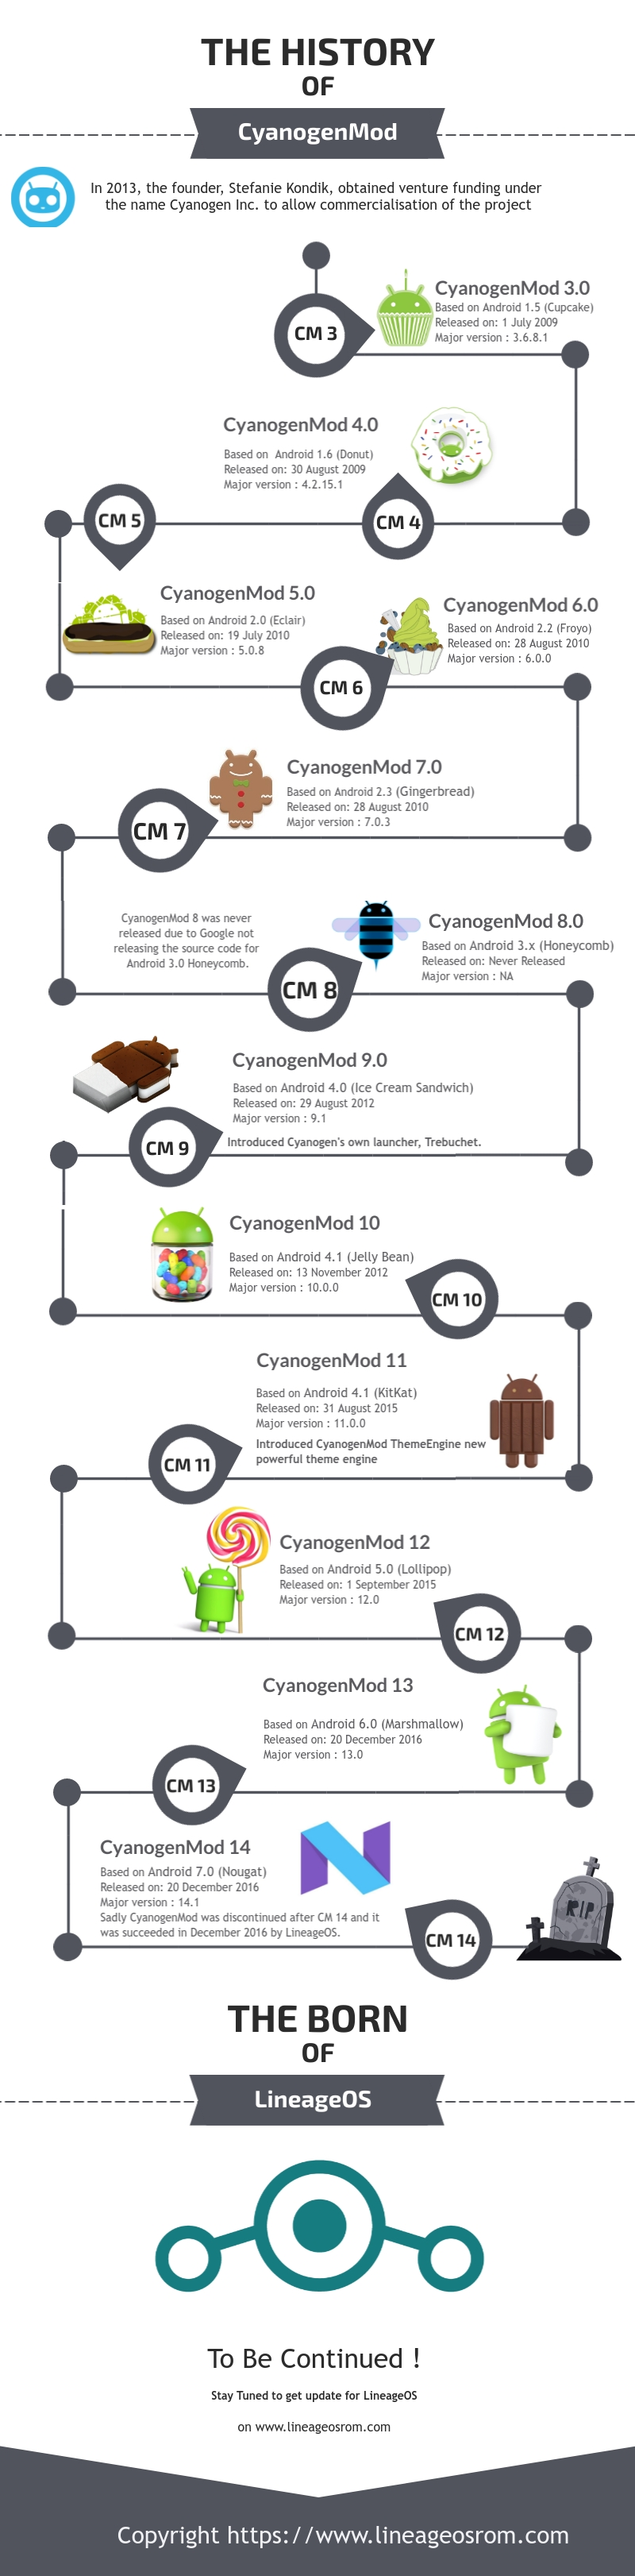 History of Cyanogenmod Rom